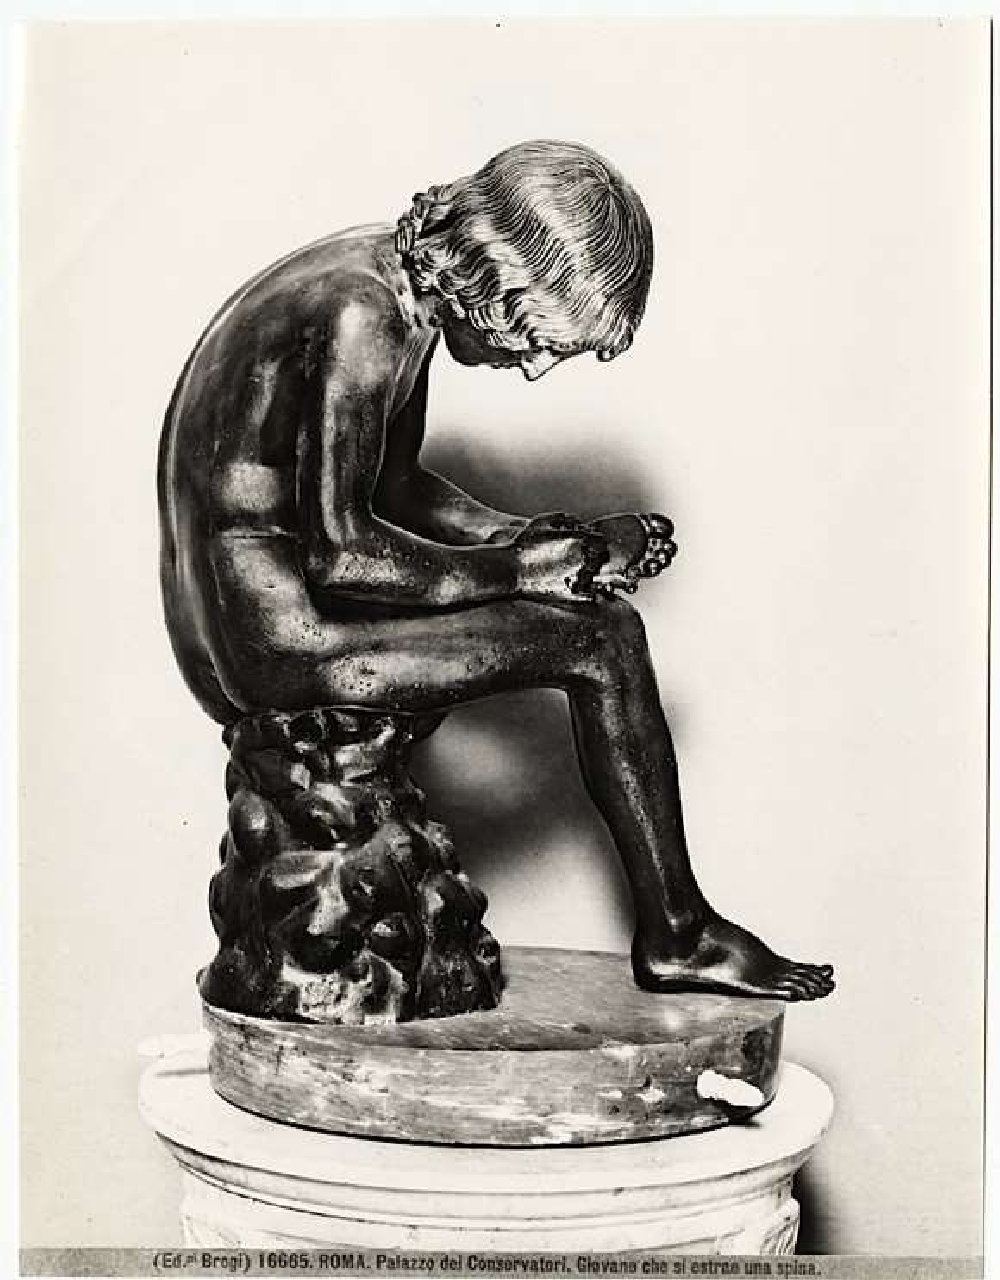 figure 2.64